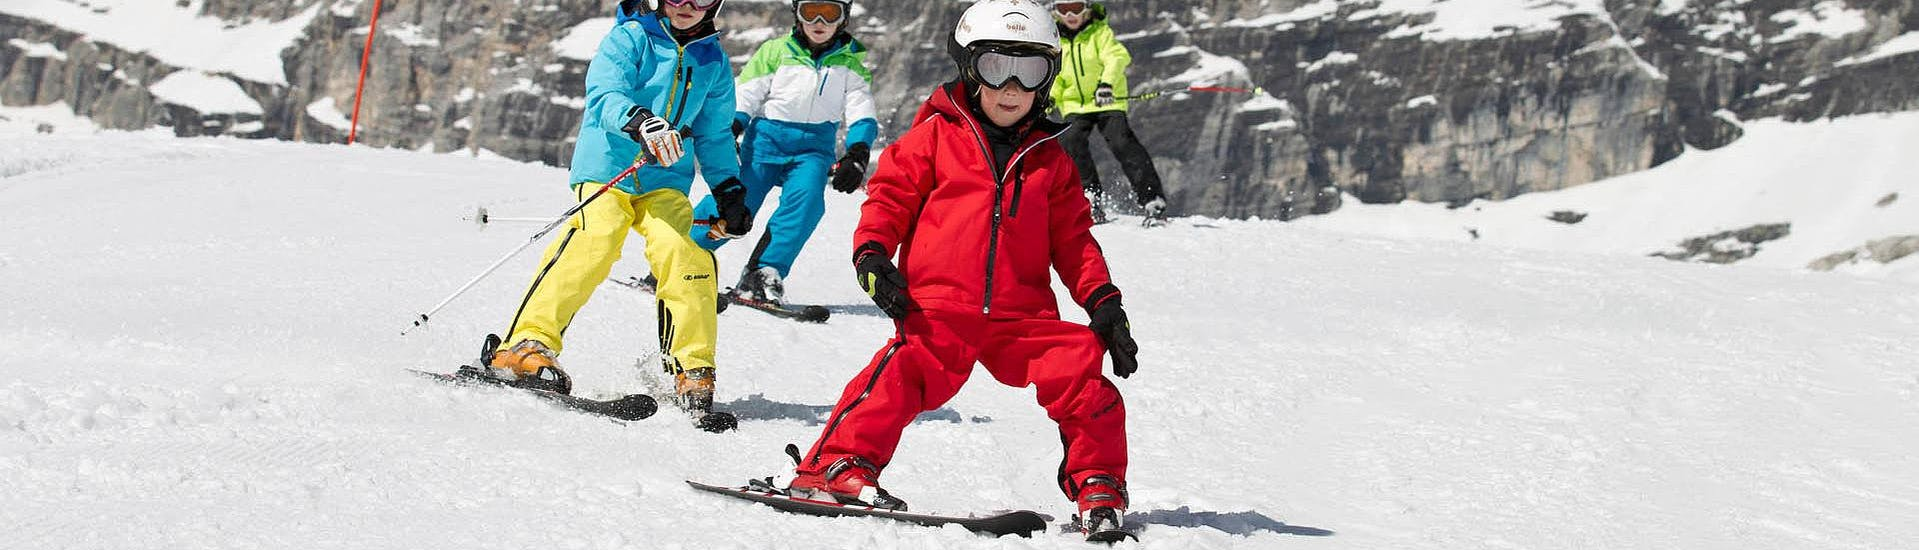 Skiing Lessons for Kids (4-12 years) - Weekend with Skischule Egon Hirt - Hero image